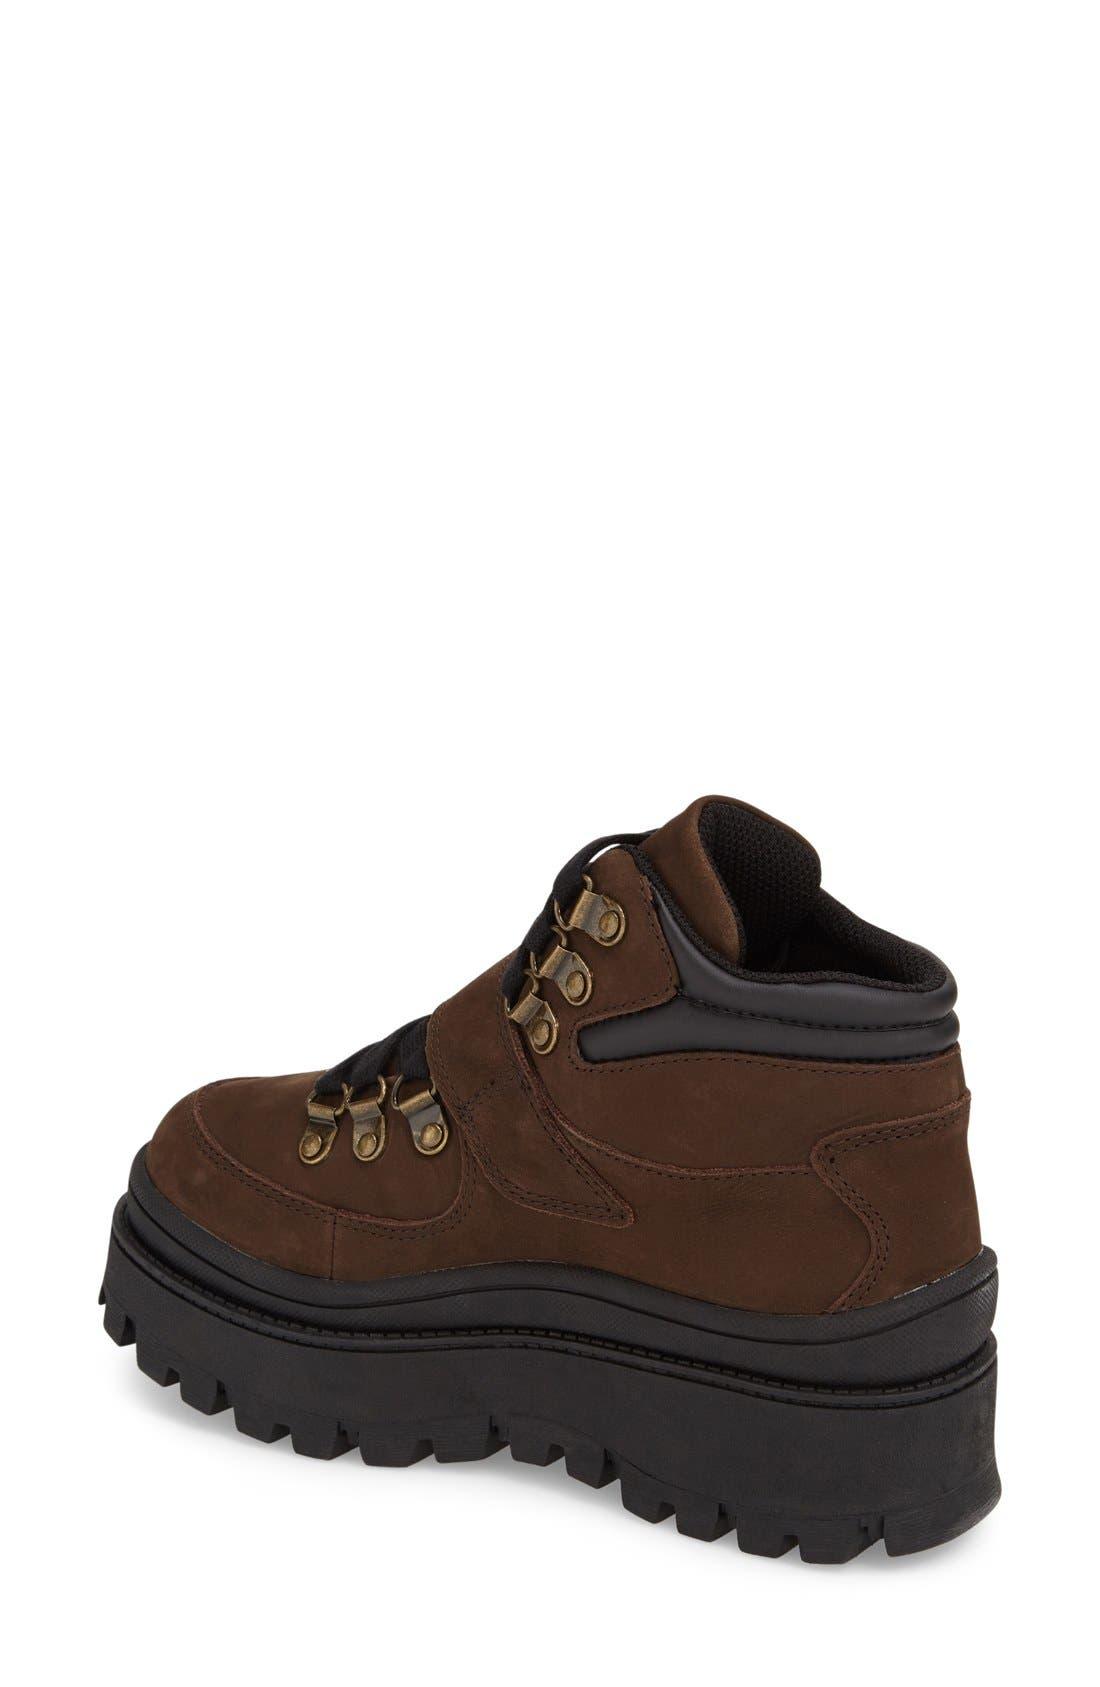 Alternate Image 2  - Jeffrey Campbell 'Top-Peak' Boot (Women)